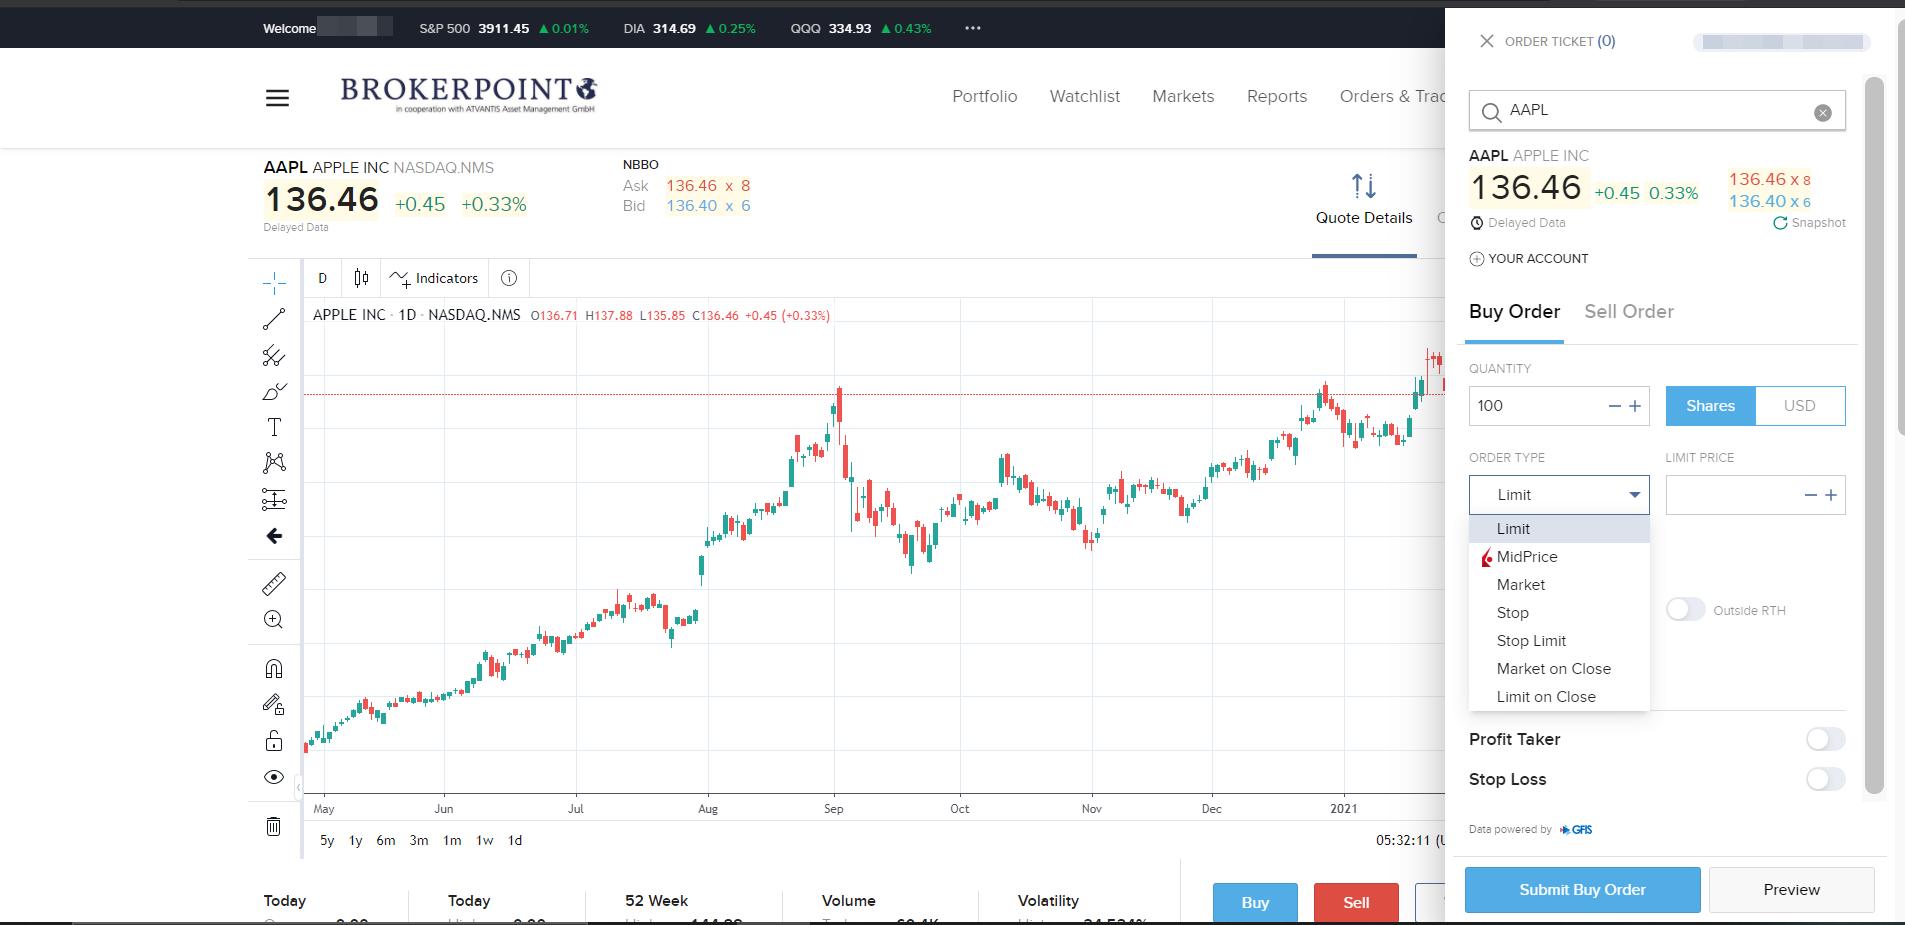 Brokerpoint review - Web trading platform - Order panel